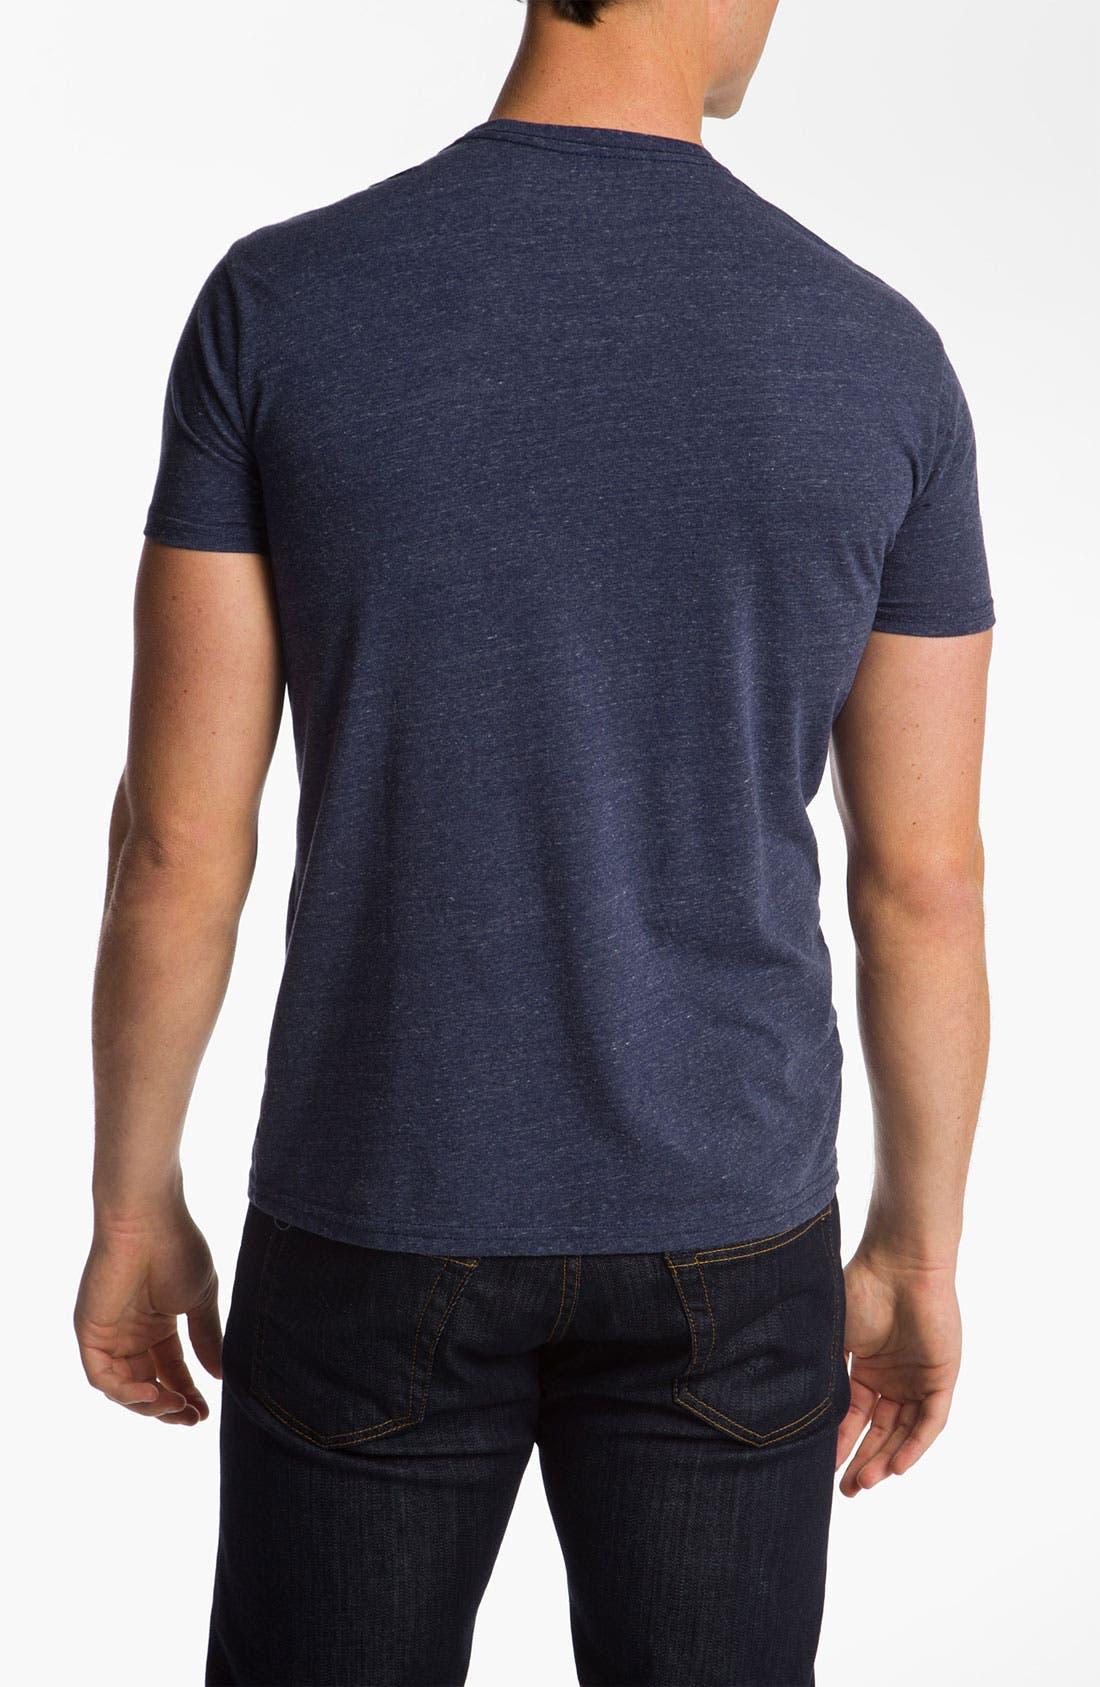 Alternate Image 2  - The Original Retro Brand 'Xavier Musketeers - Stitch' T-Shirt